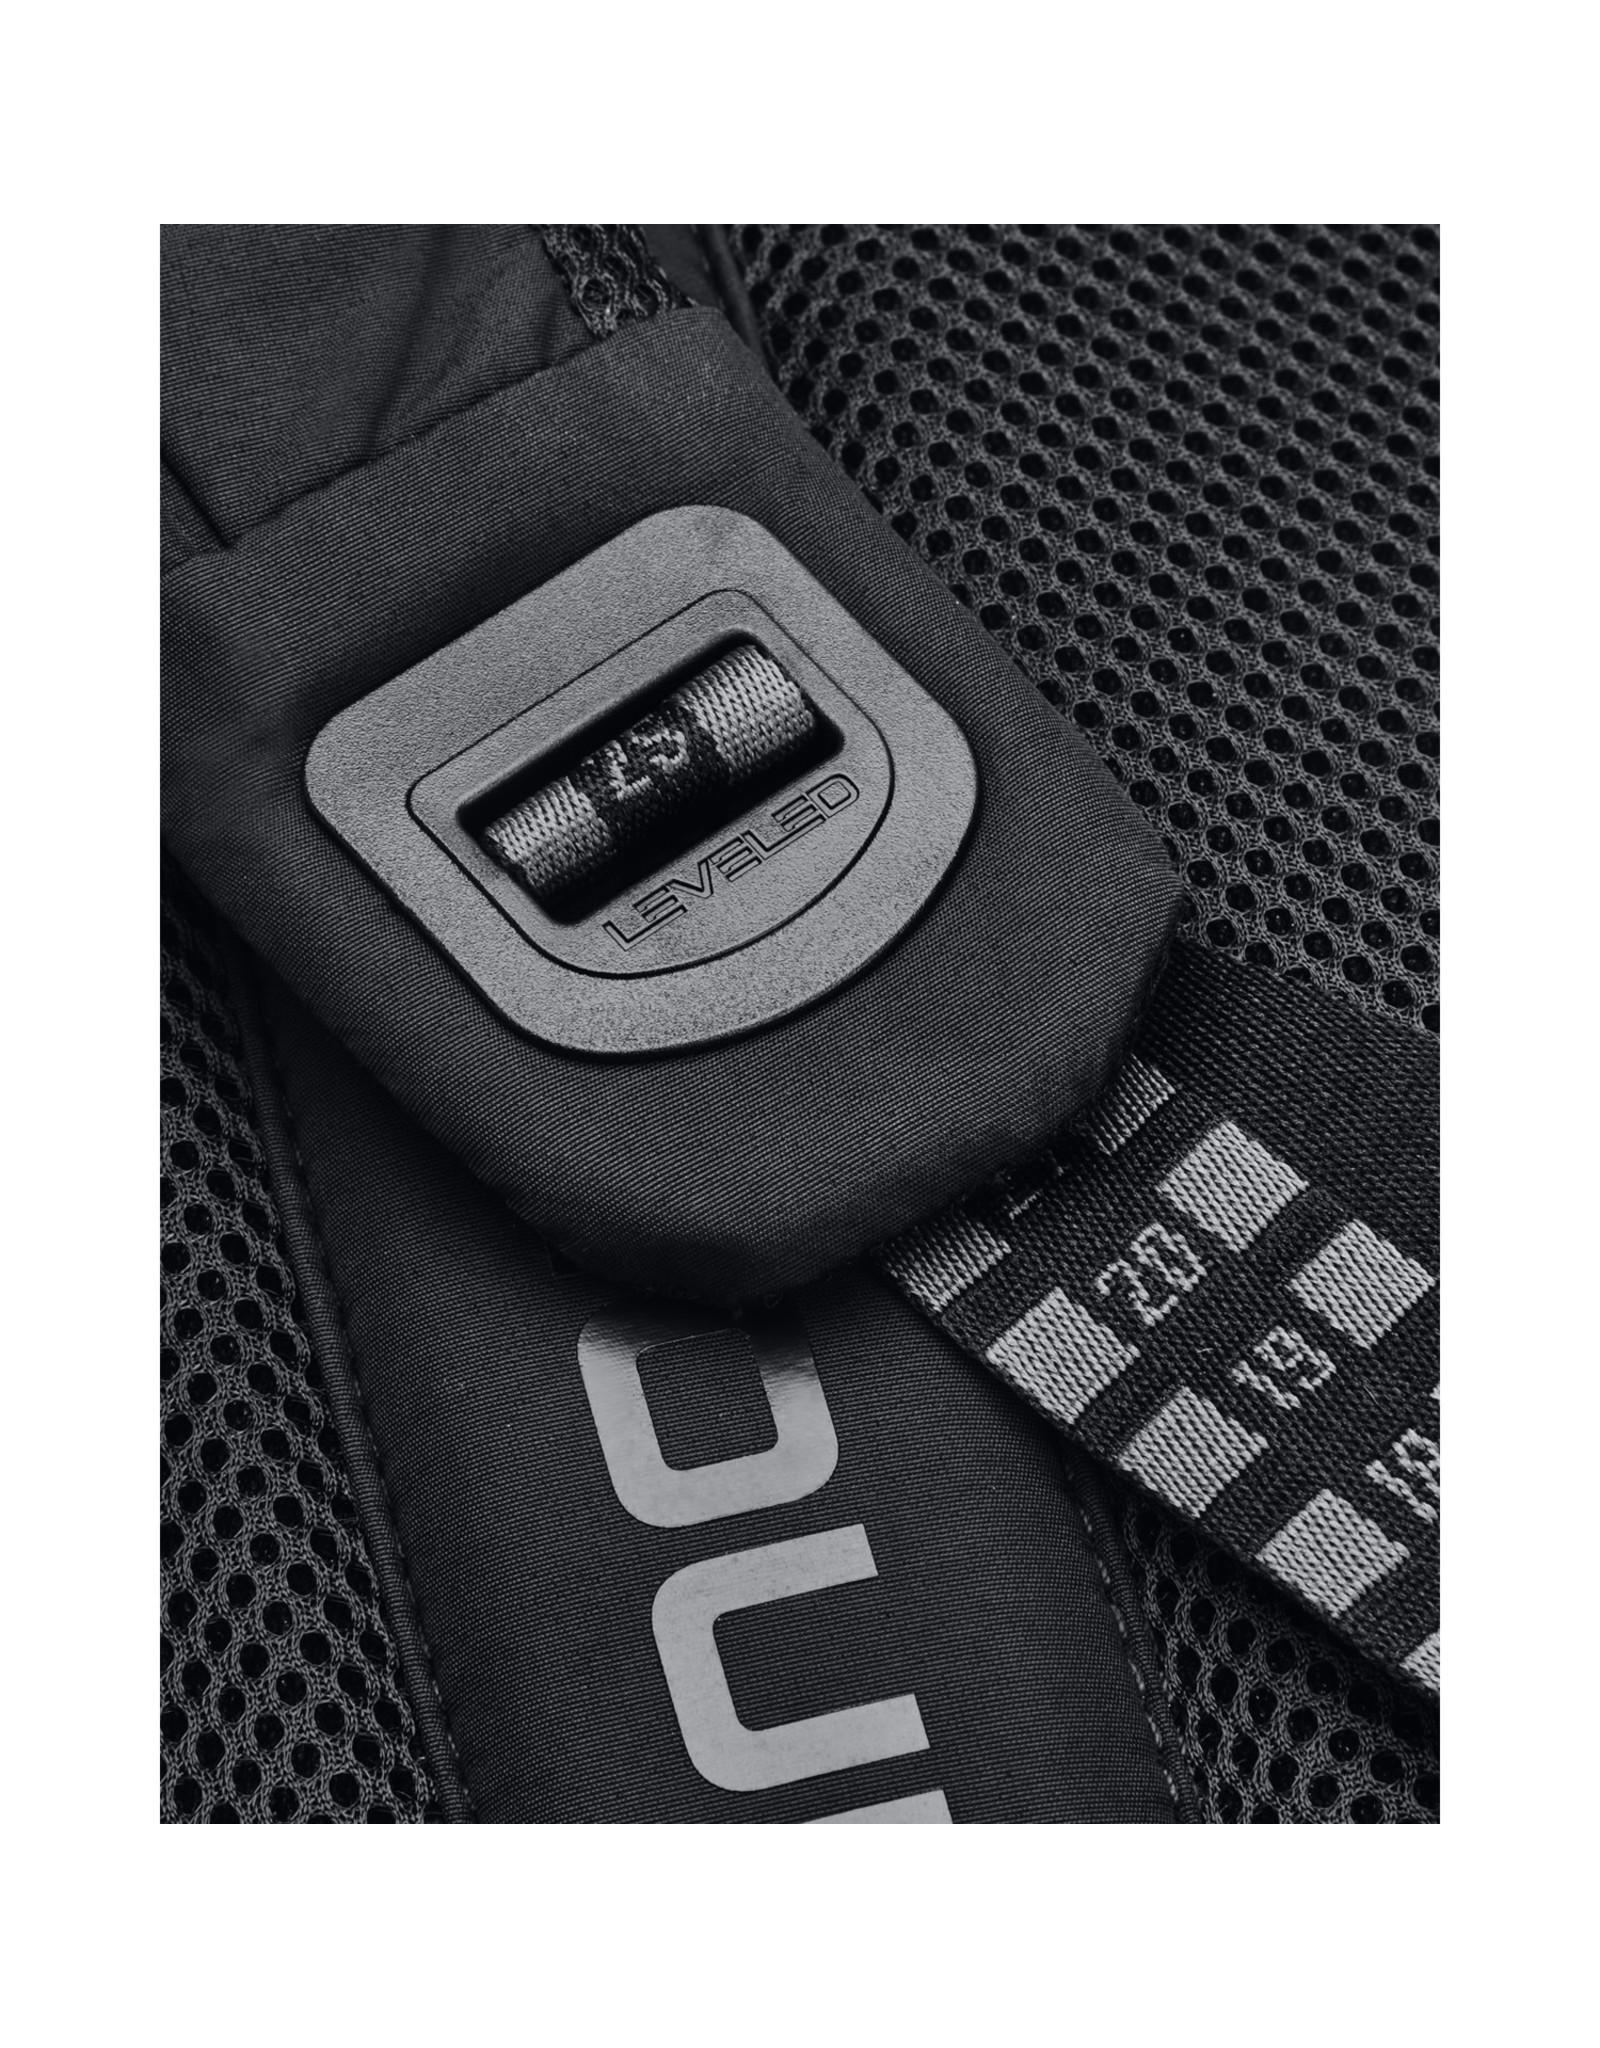 Under Armour UA Triumph Backpack-Black